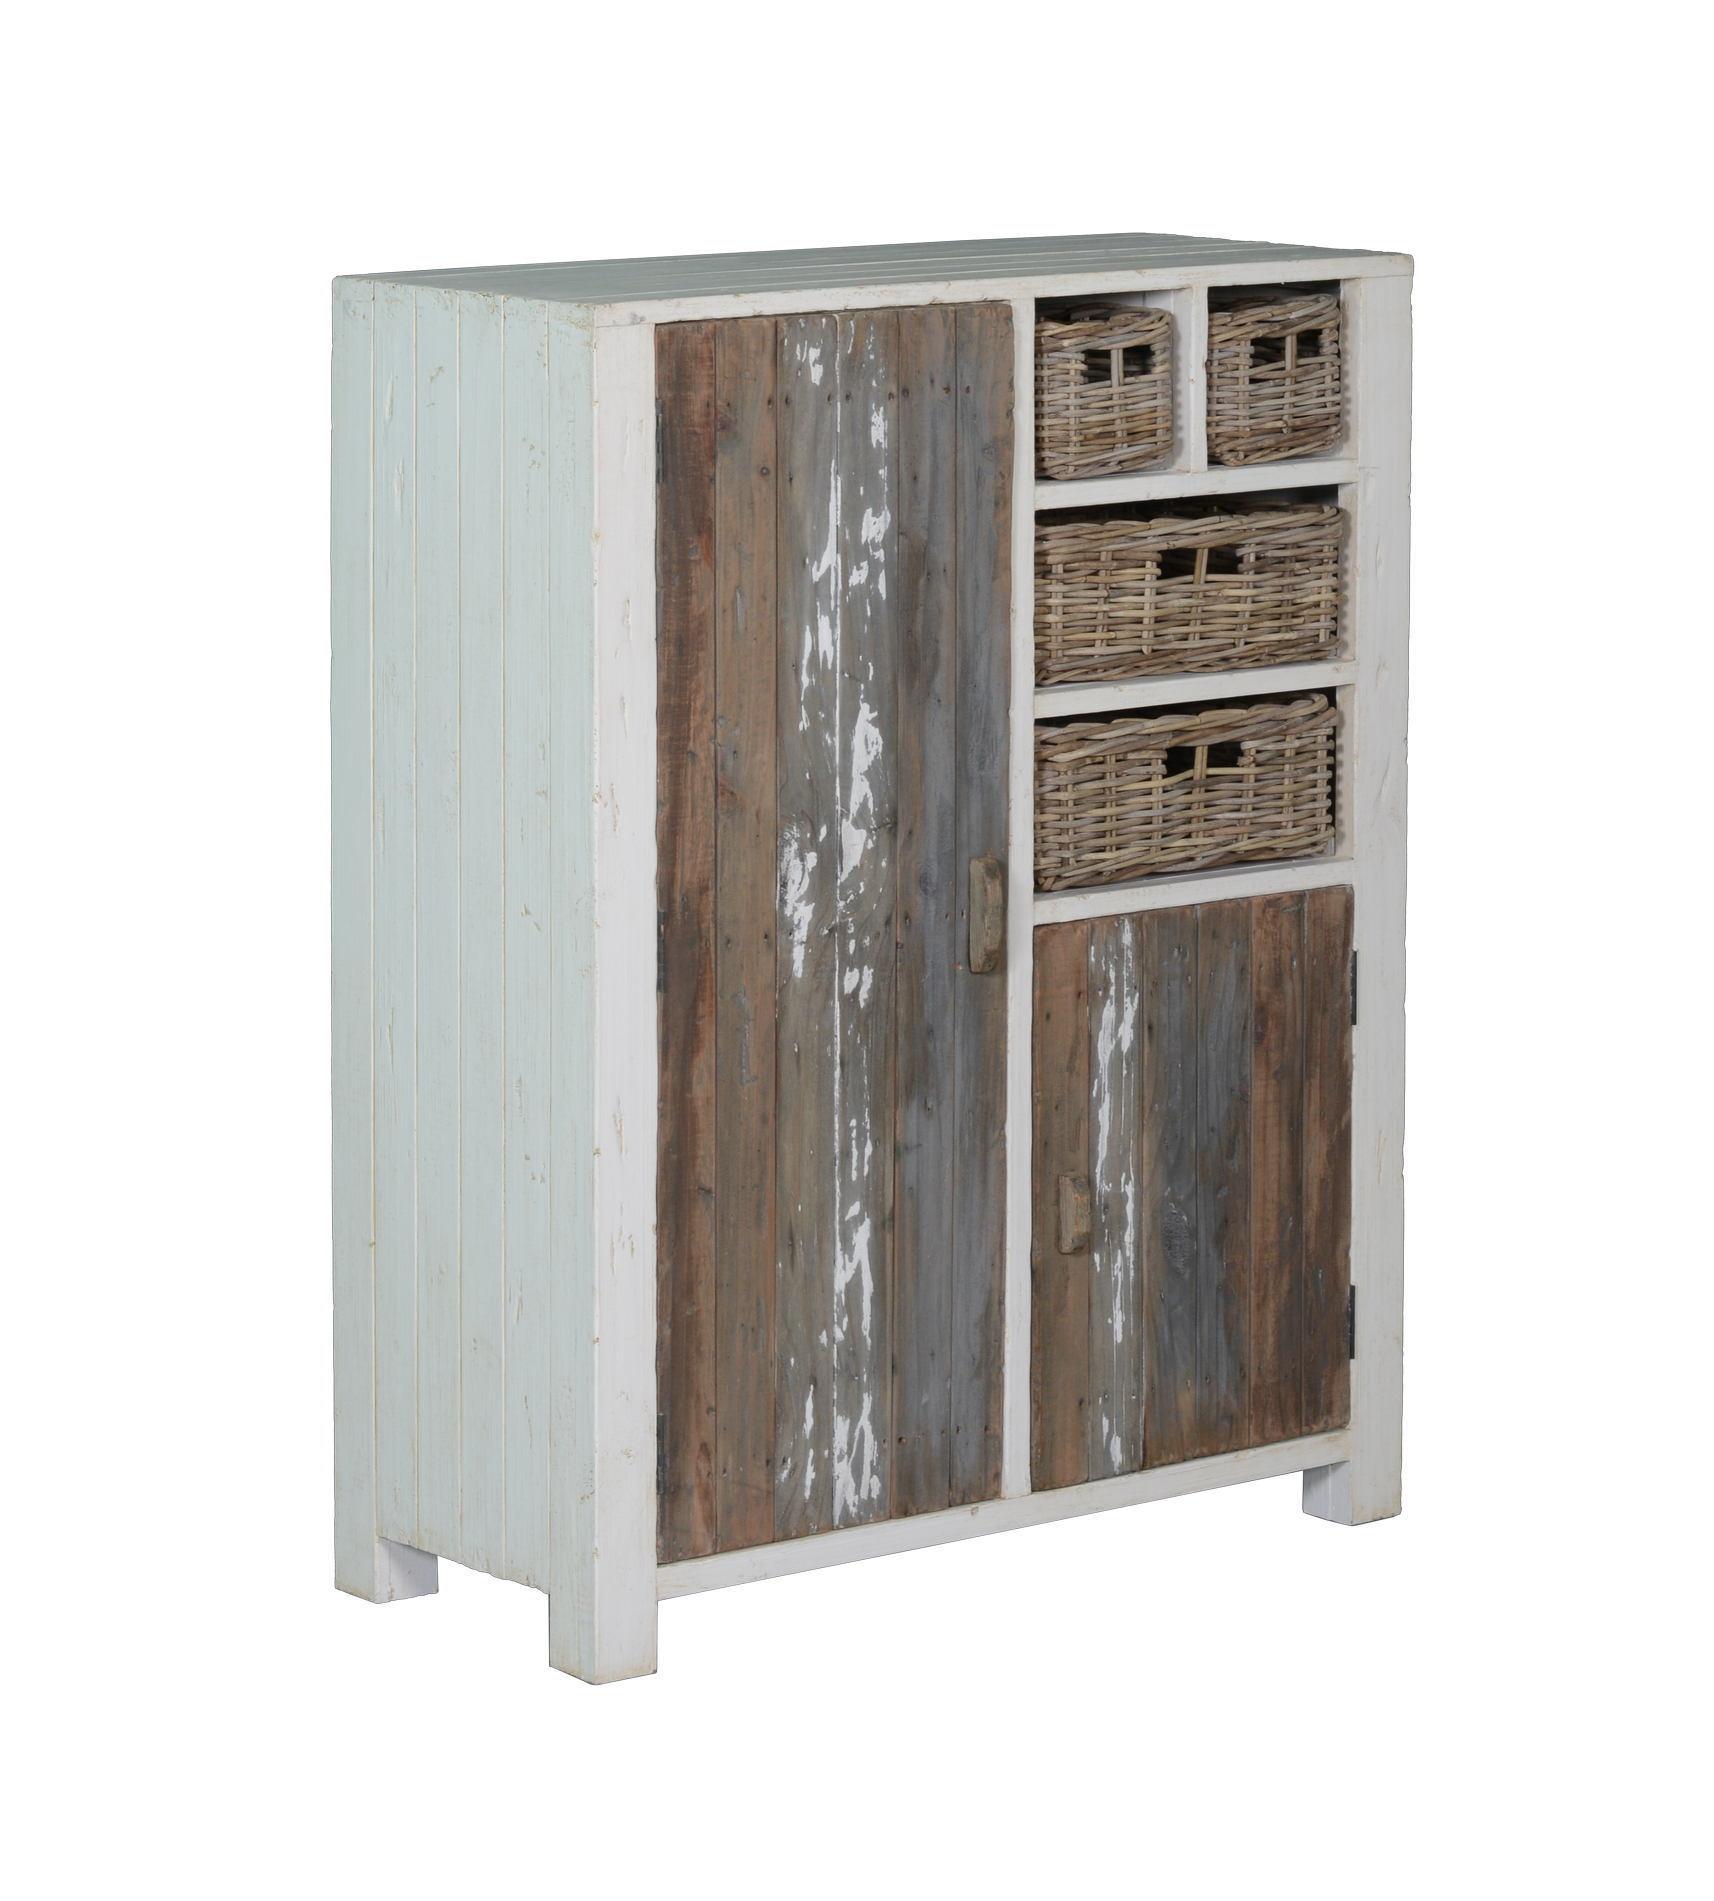 kasten-daan-spekkast-towerliving-KL 0103-101cm-grenen-oud wit-grijs-vintage-mandjes-deurtjes